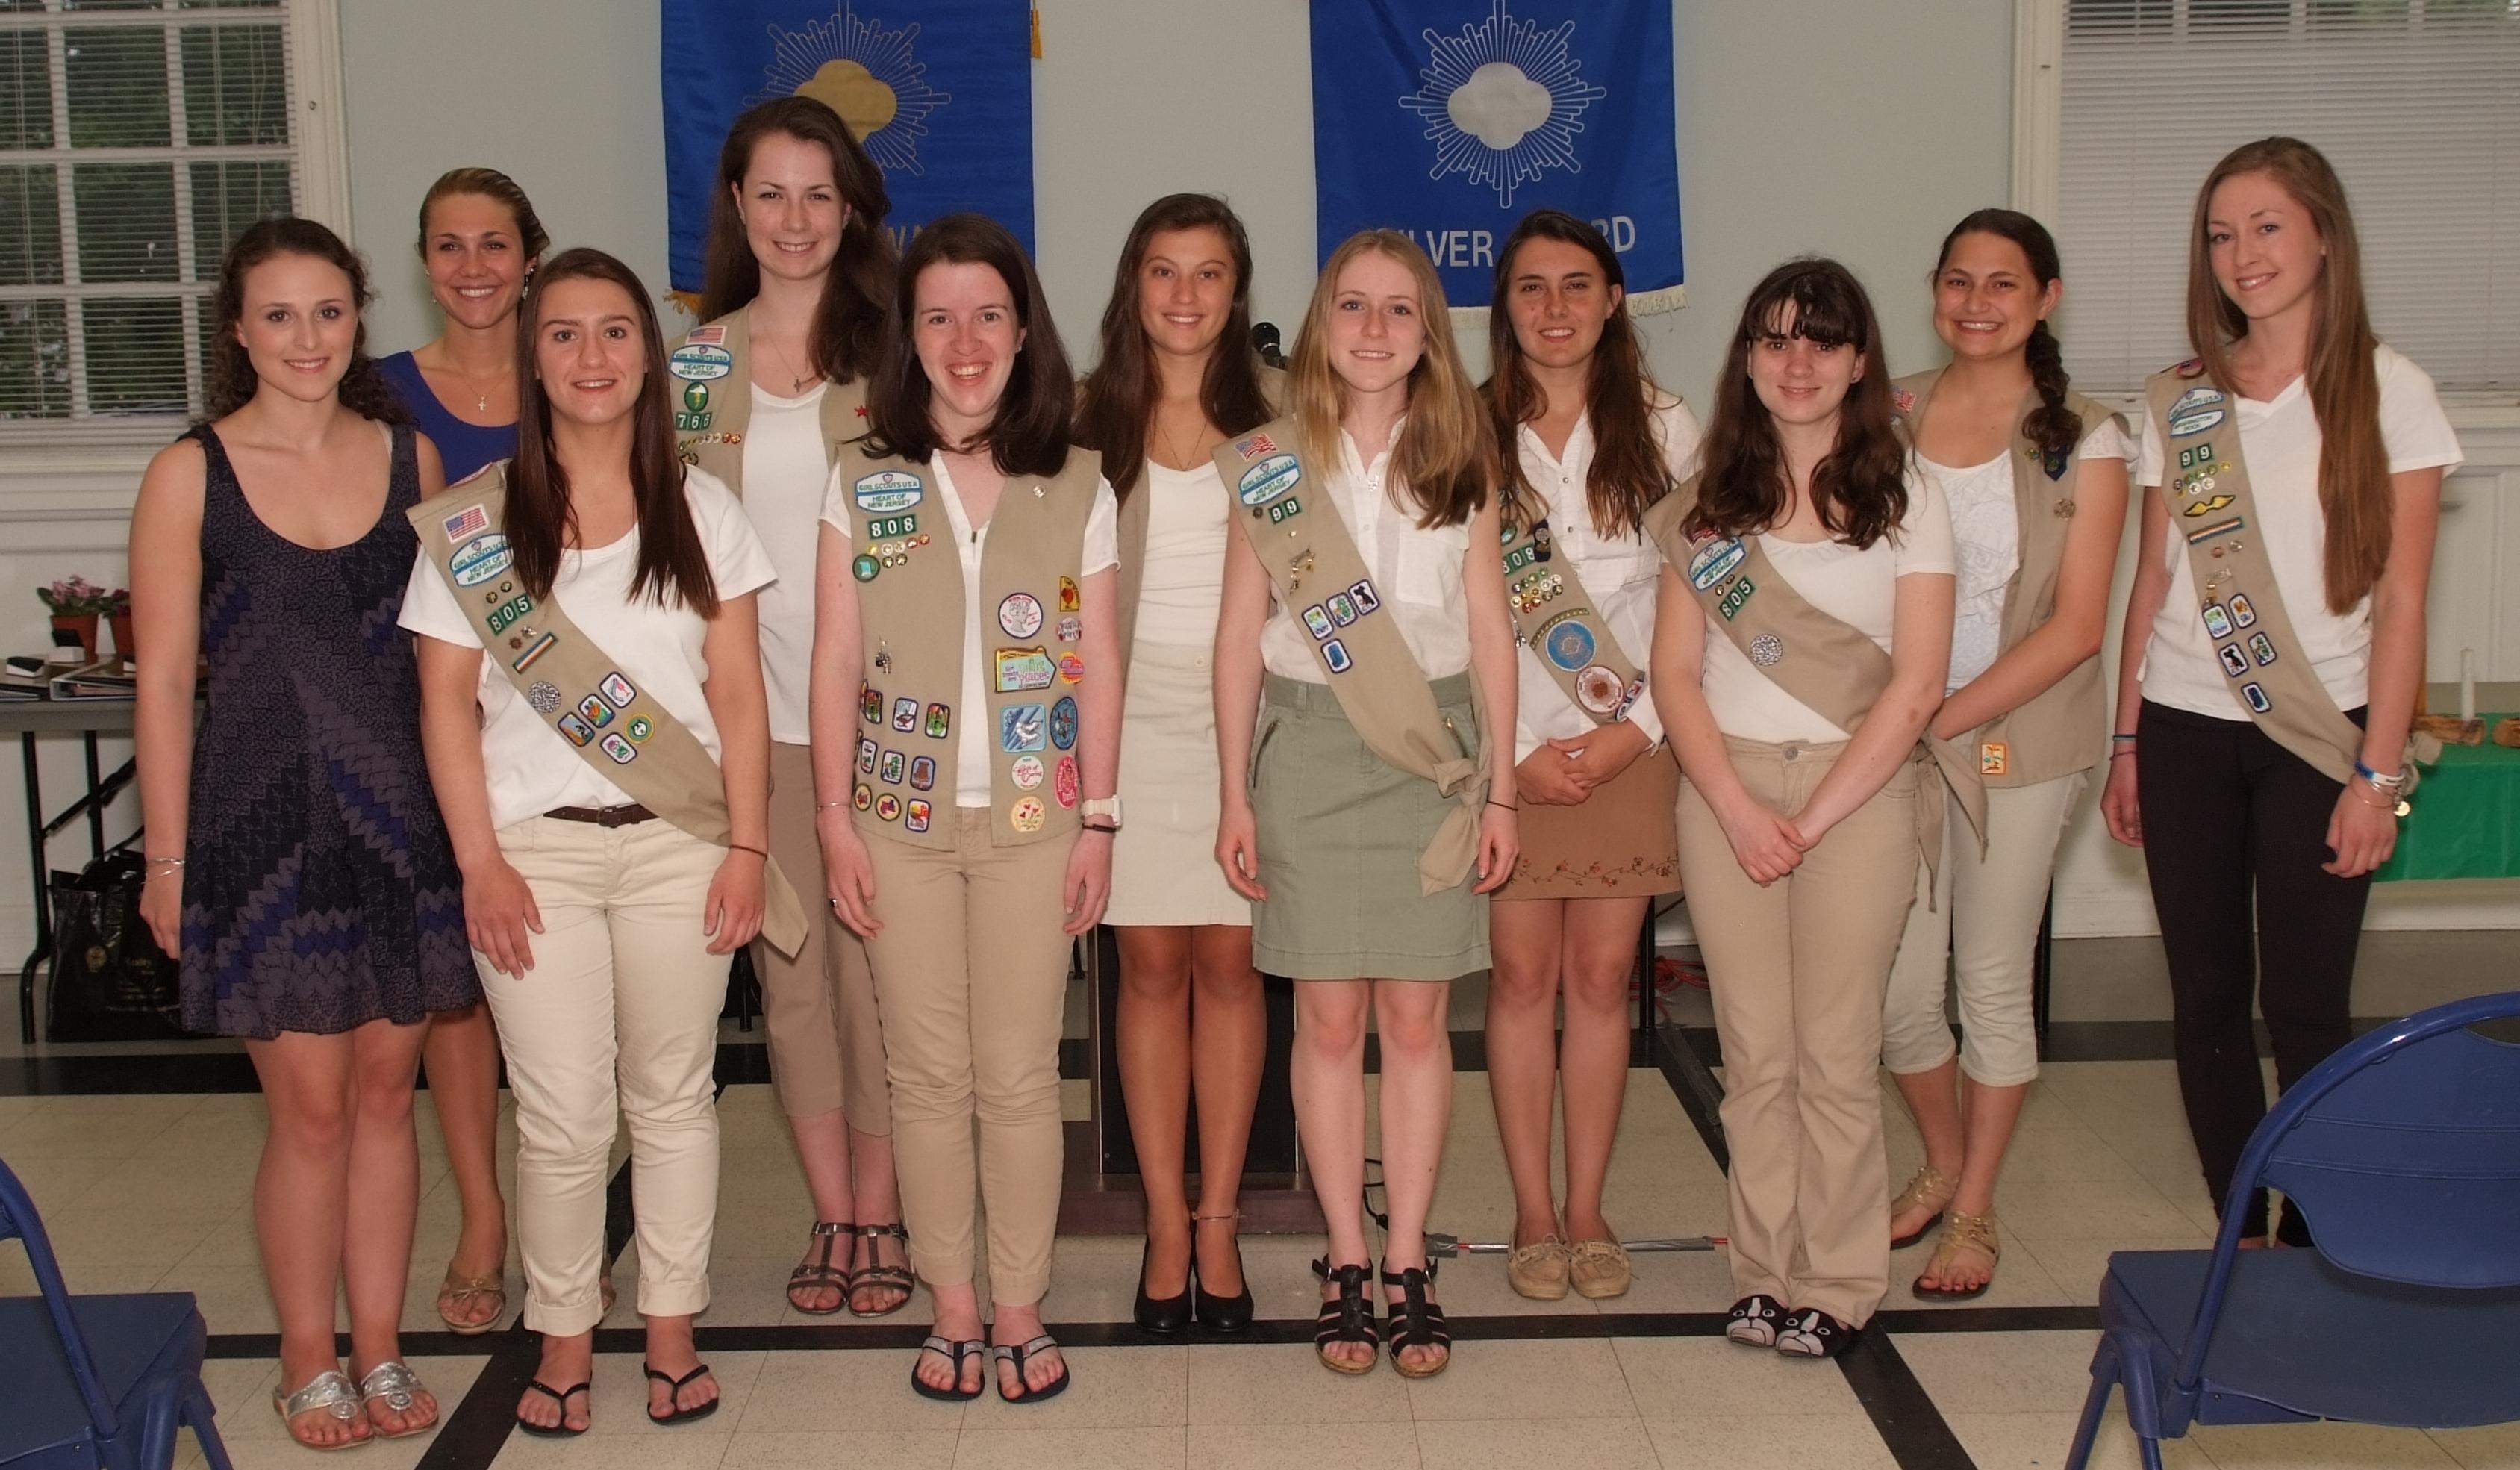 fba3590c31da0e0ed259_Westfield_Girl_Scout_Gold_Award_2014.jpg